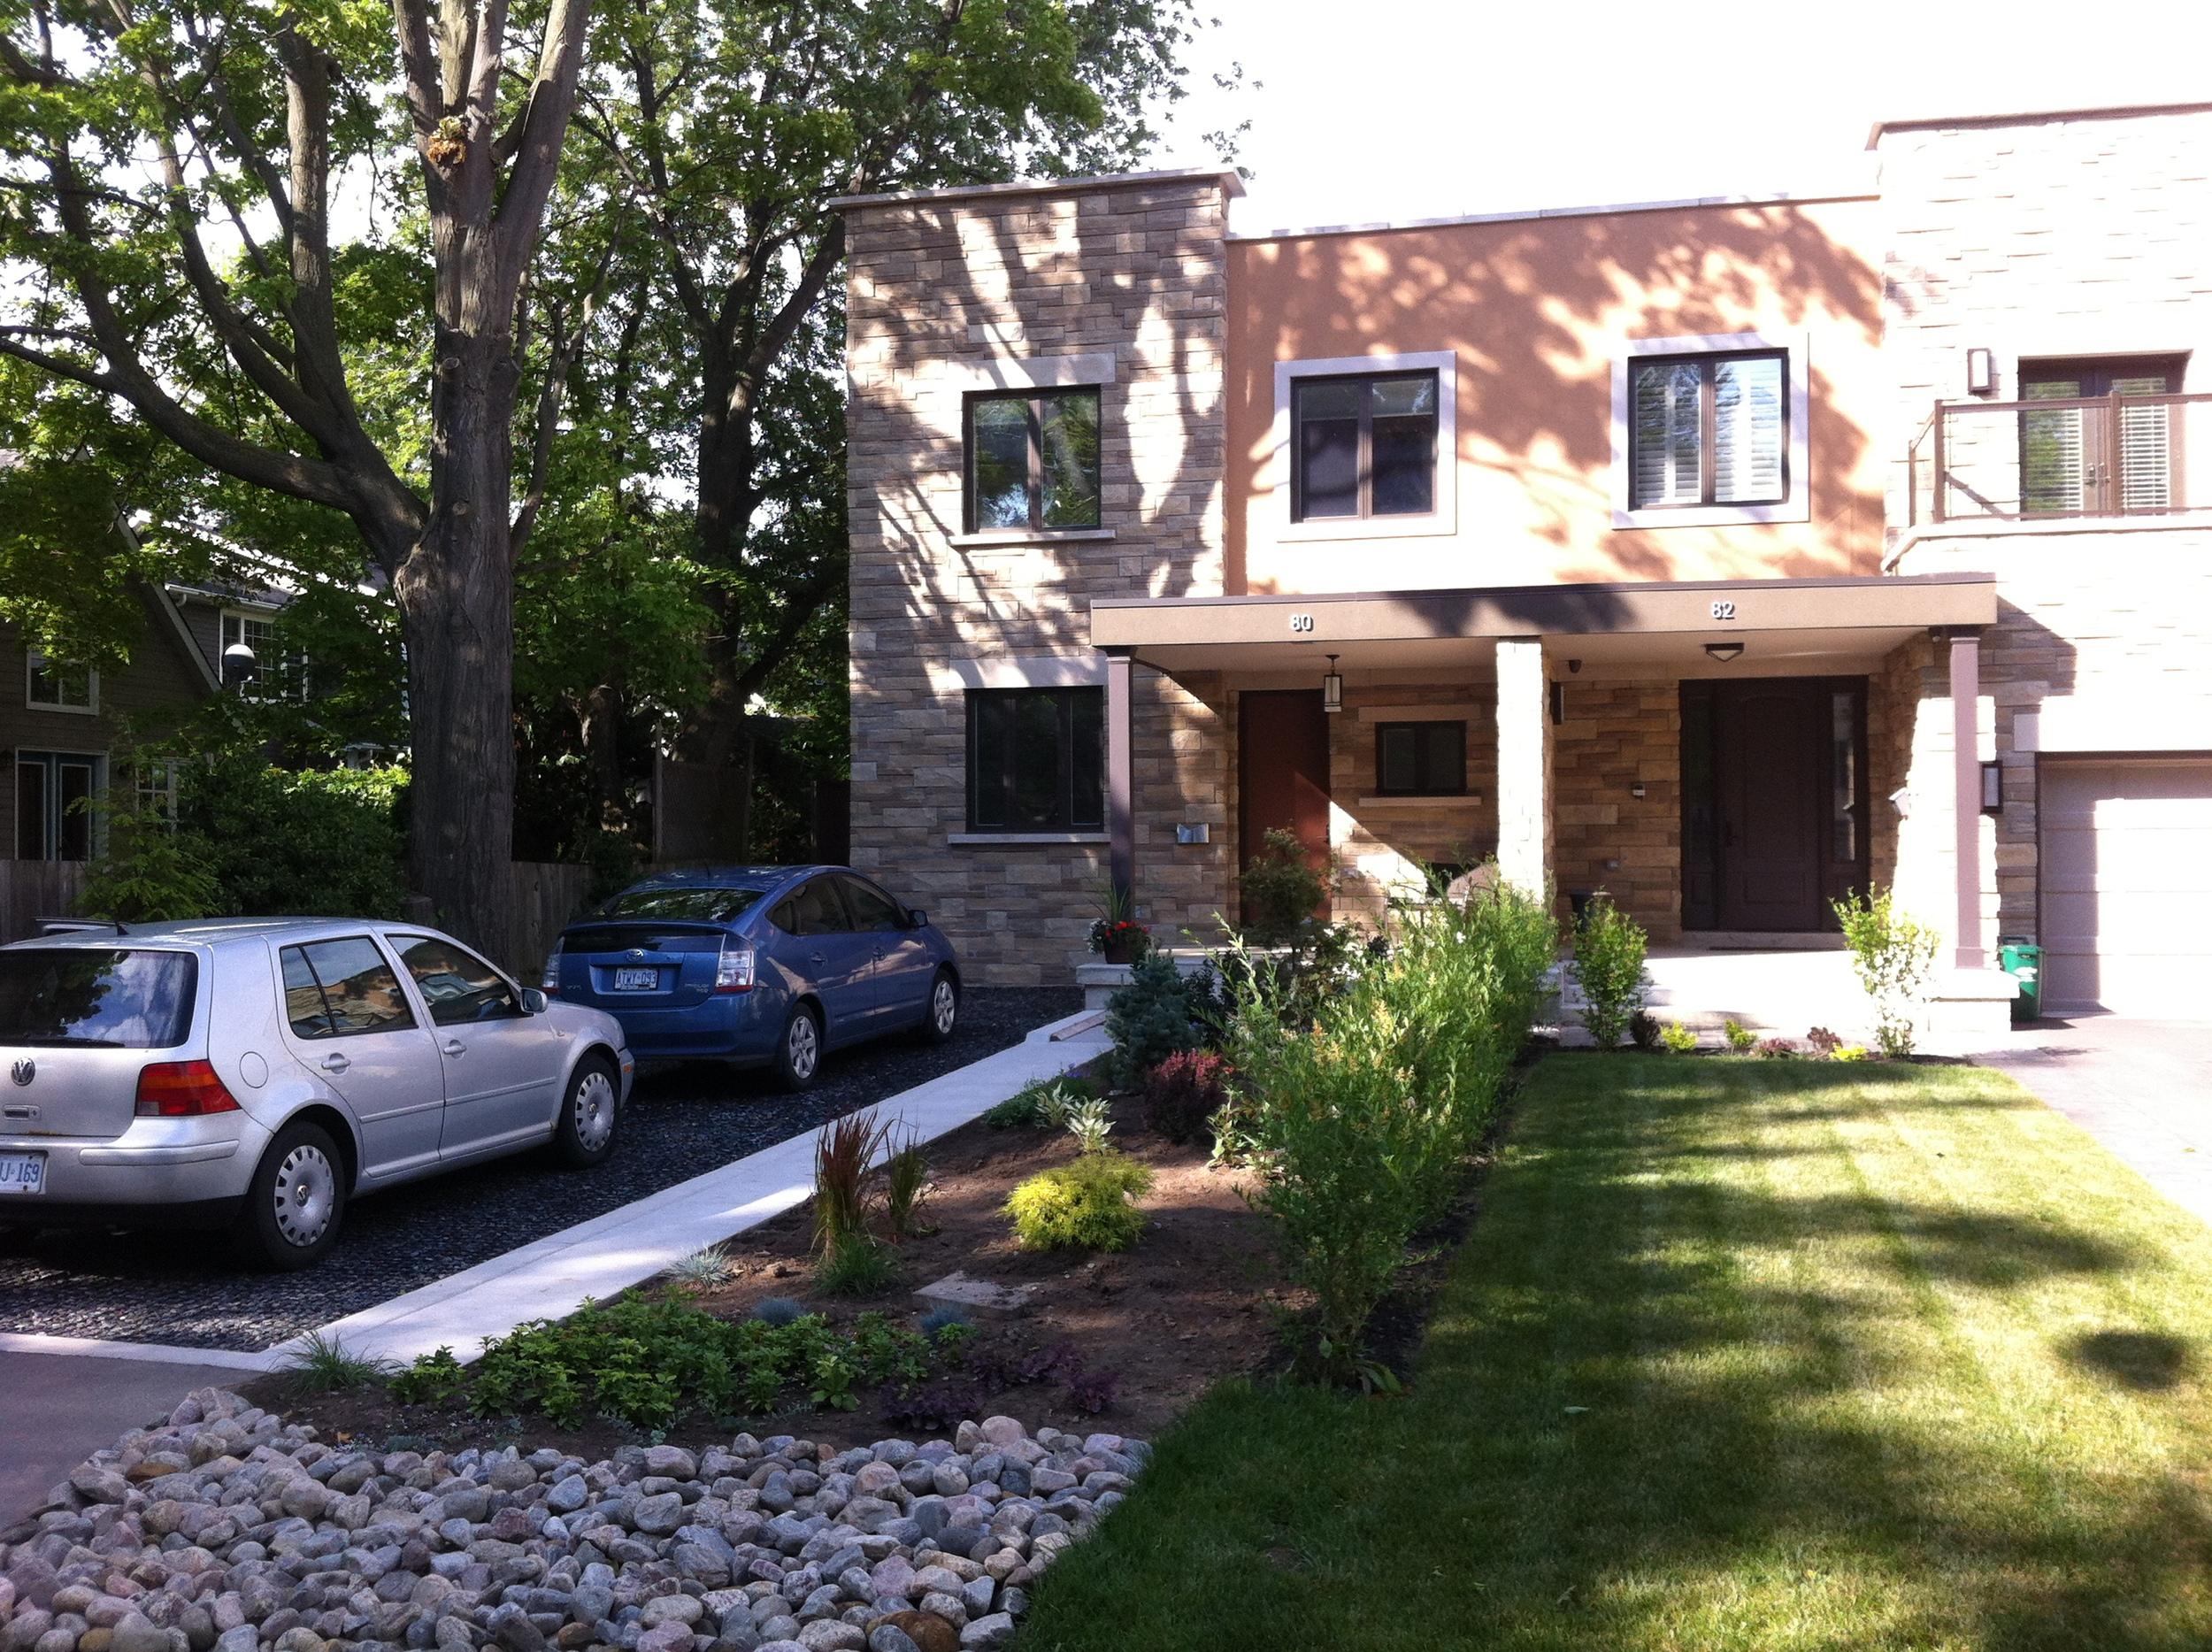 Brant Street Passive House Duplex, Oakville, ON. Credit - Passive House Ontario.